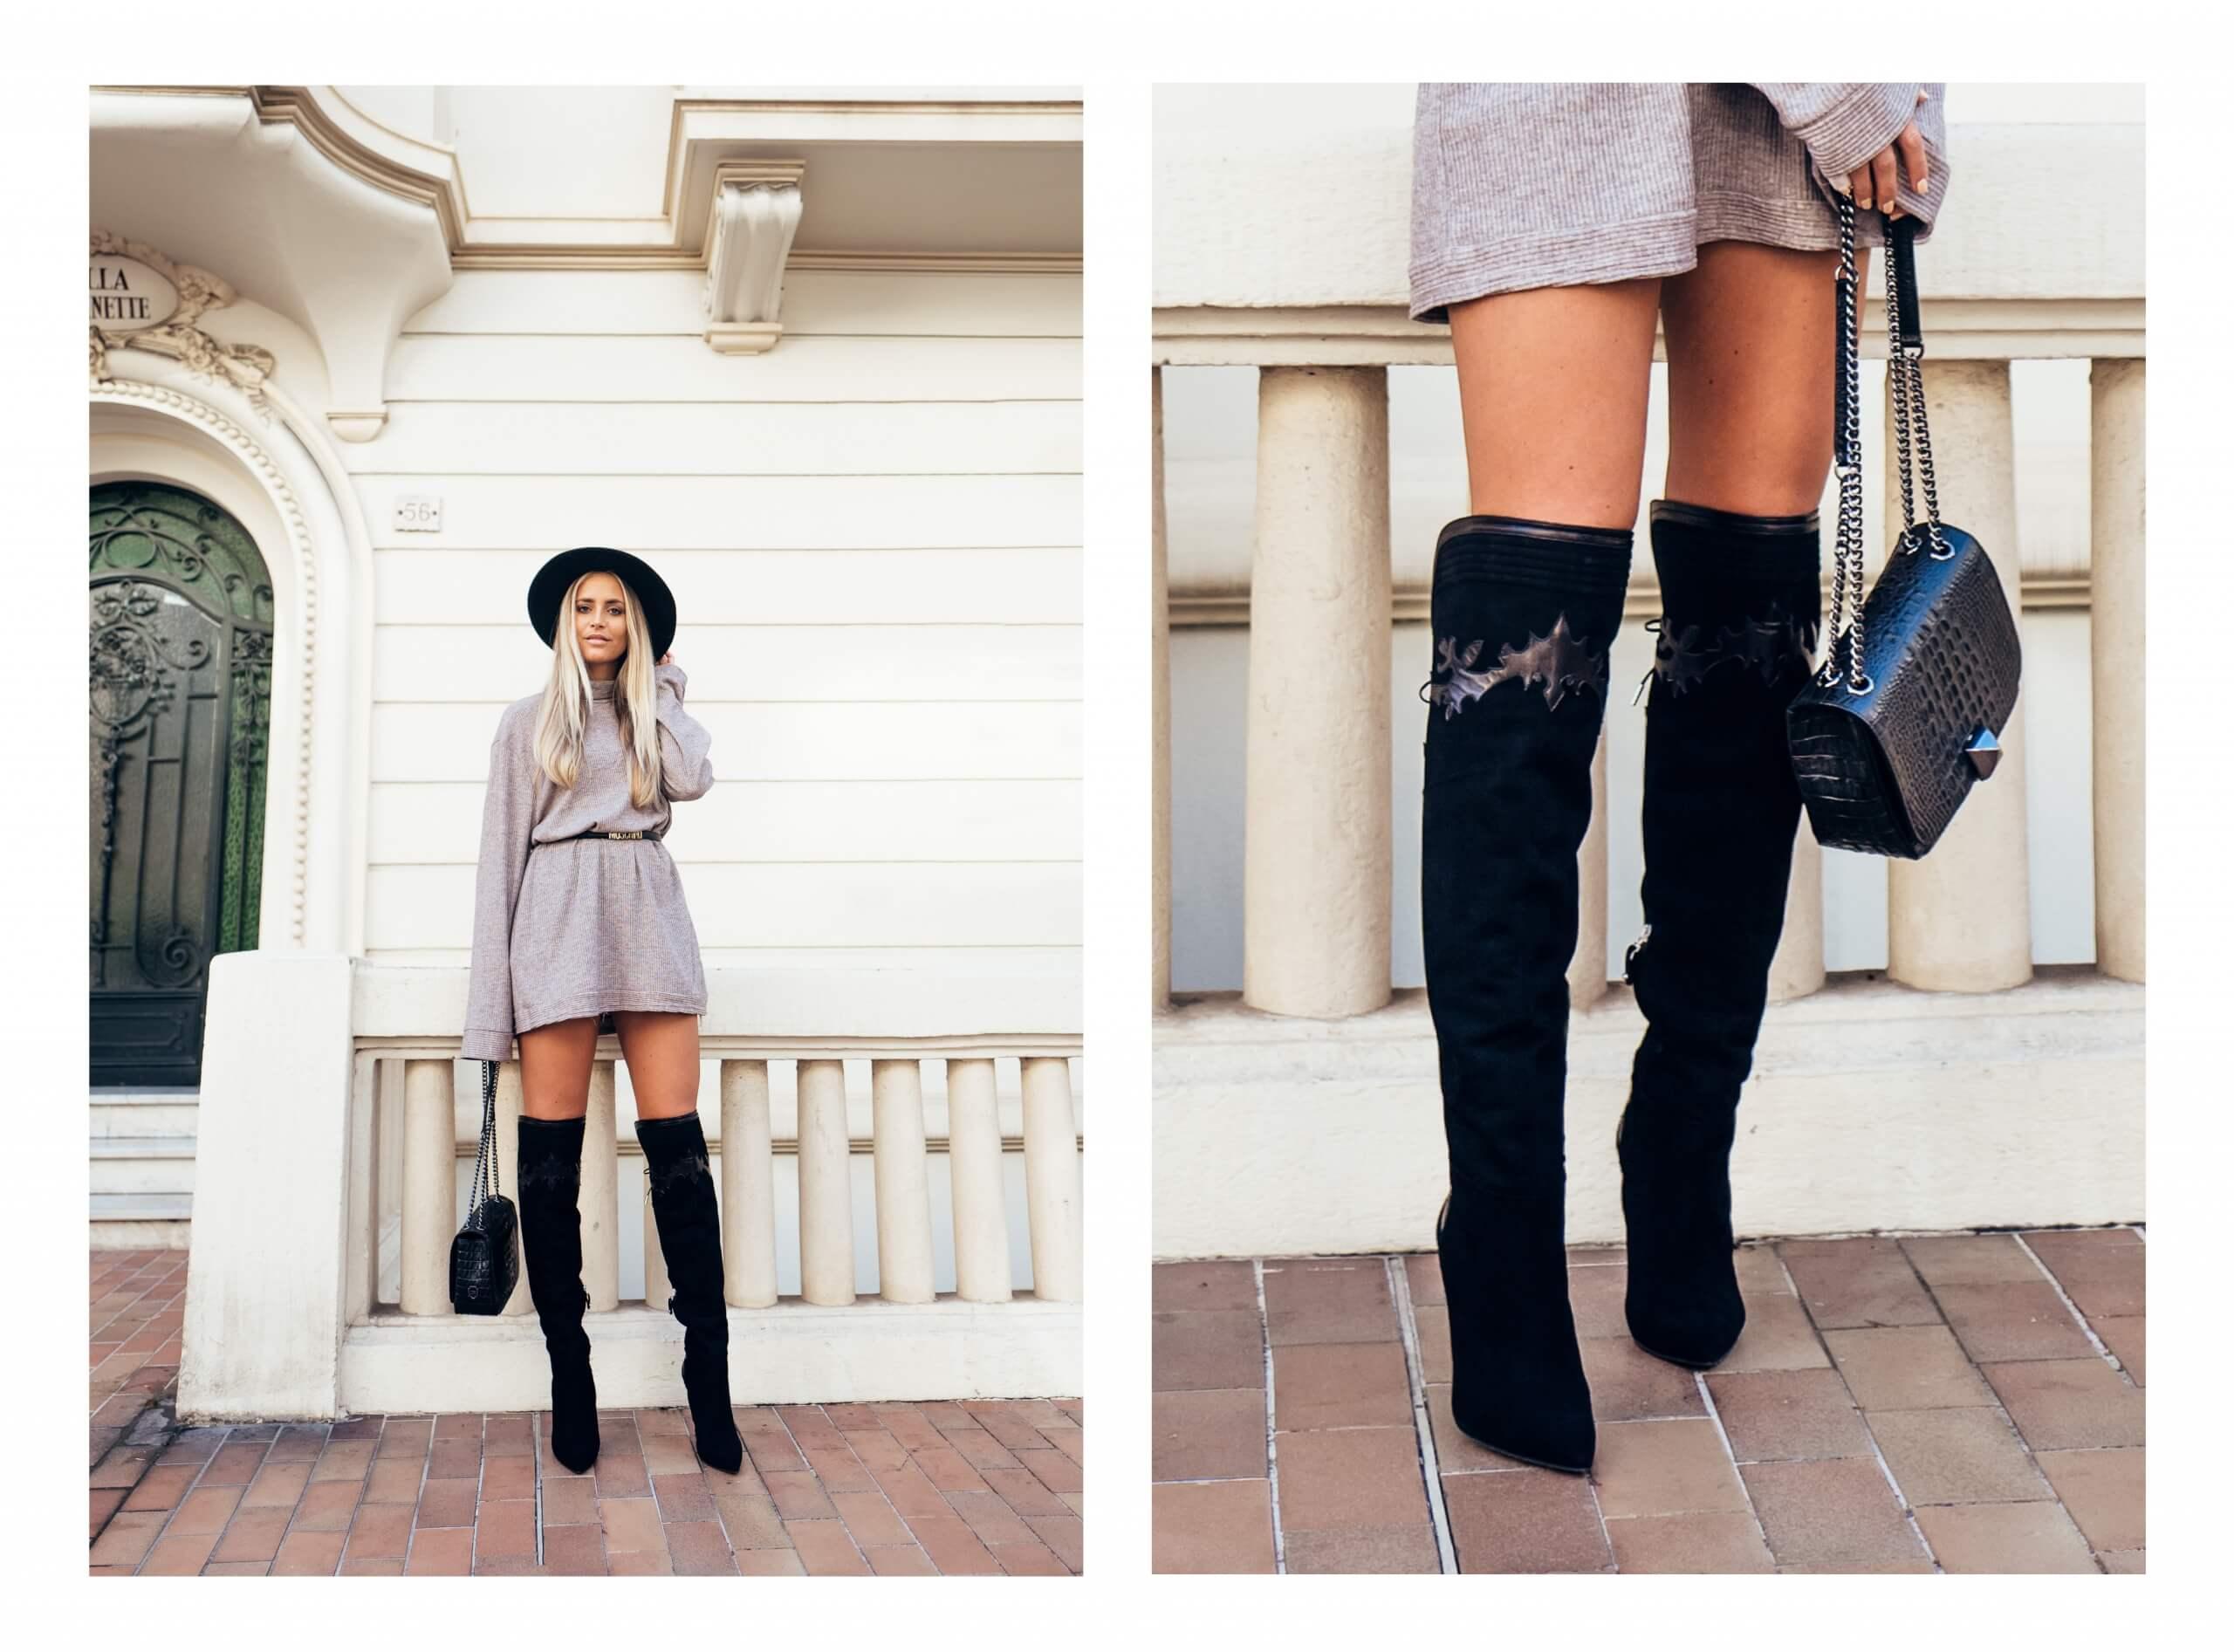 janni-deler-boots-made-for-walking-rebeccabjornsdotterl1180419-redigera-copy